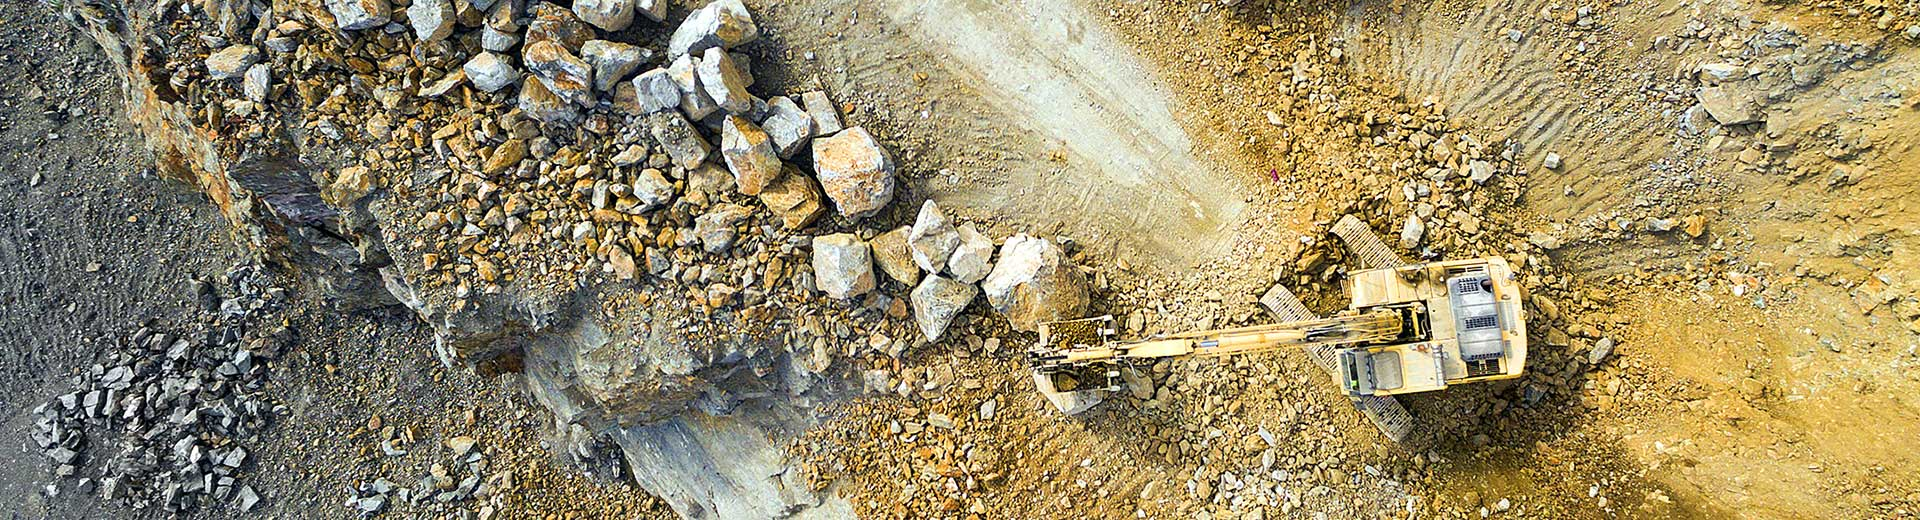 Stone Quarrying Construction | IMS Marketing